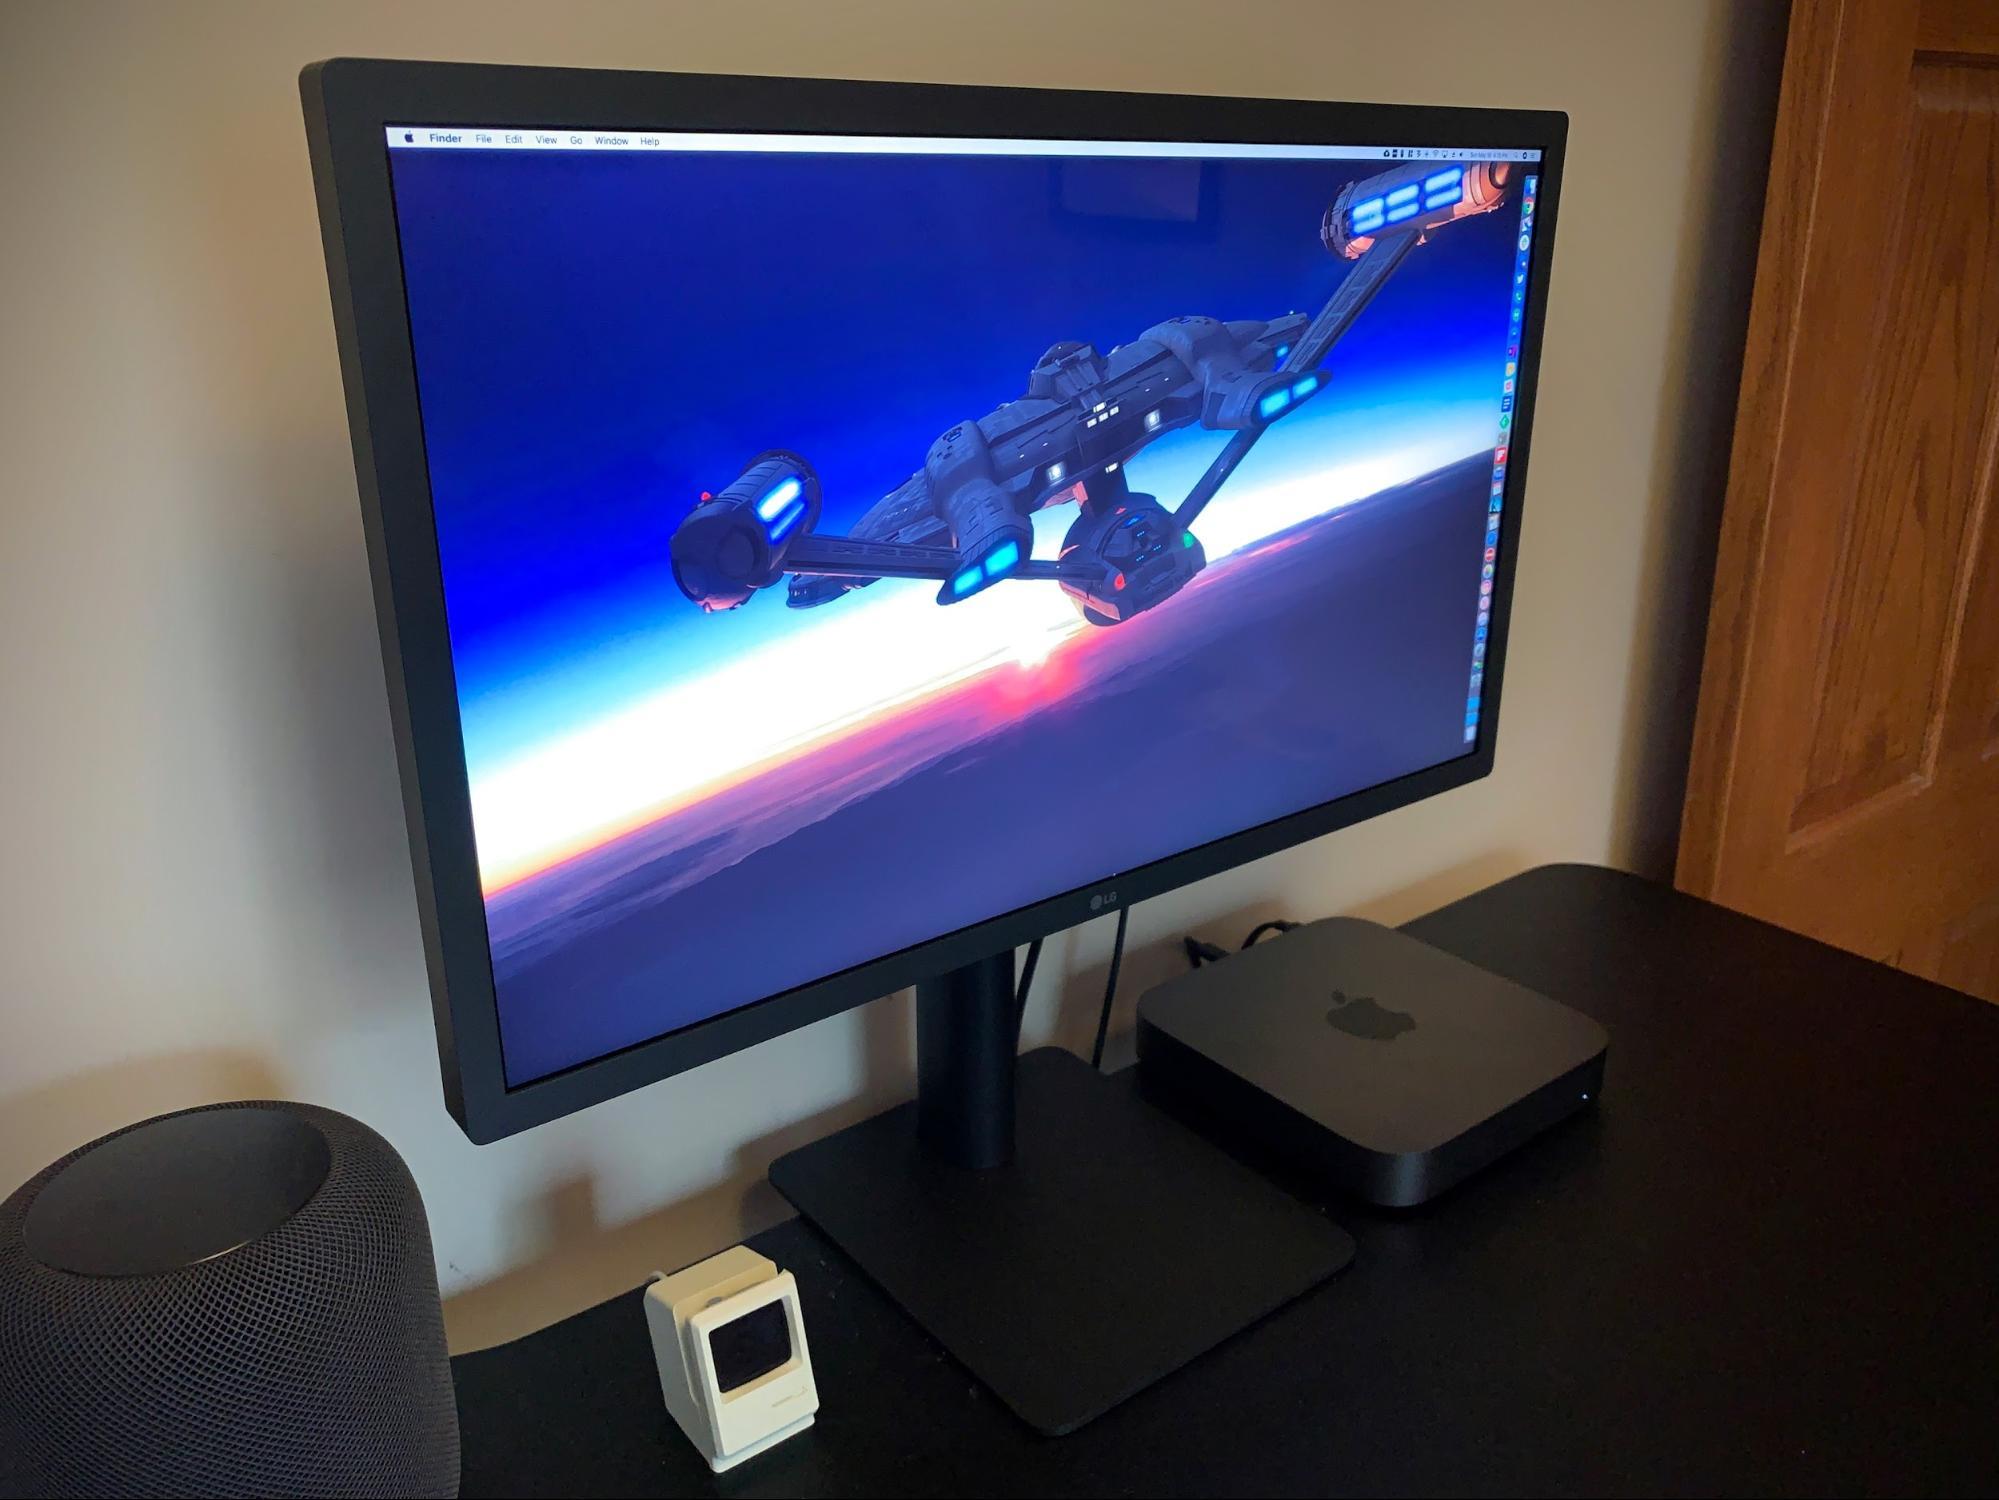 Apple Debuts LG's All-New 23 7-inch UltraFine Display - TidBITS